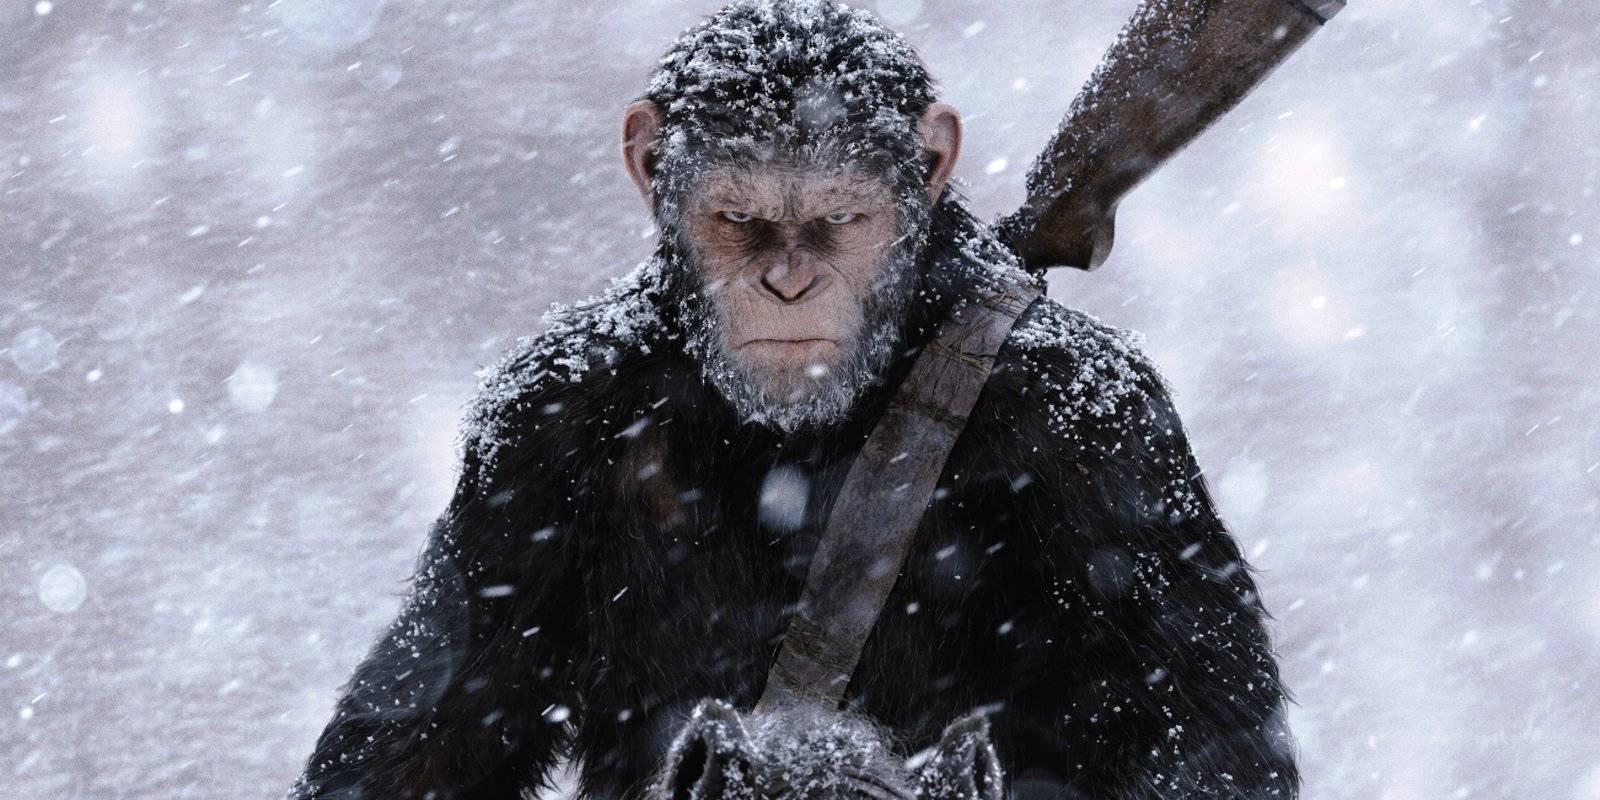 «Планета обезьян: Война» — лучший «Варкрафт», чем сам «Варкрафт»